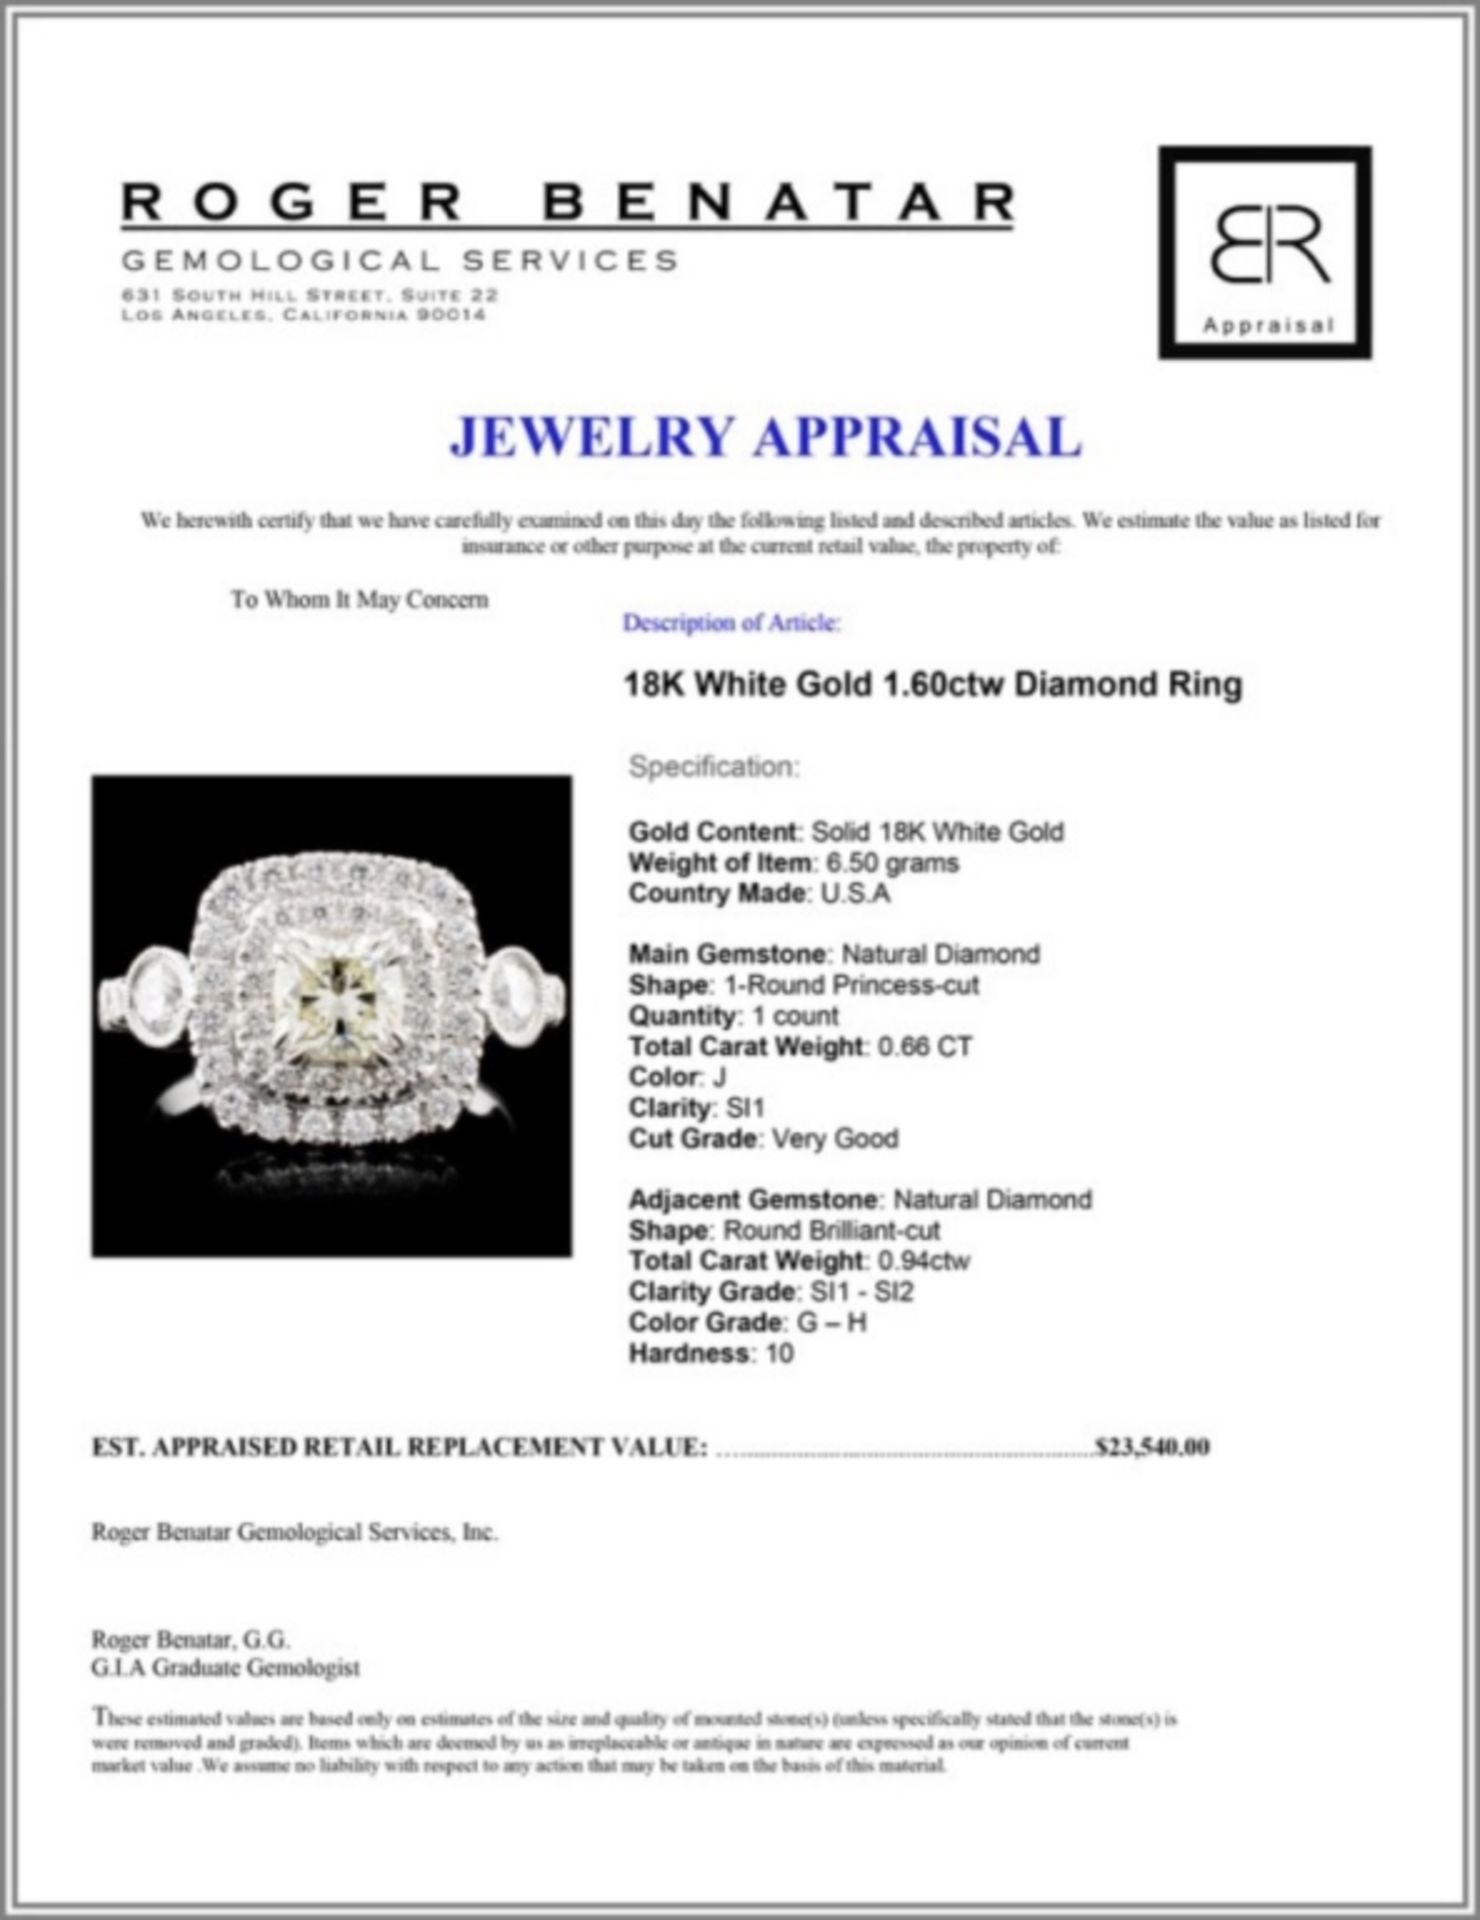 18K White Gold 1.60ctw Diamond Ring - Image 4 of 4